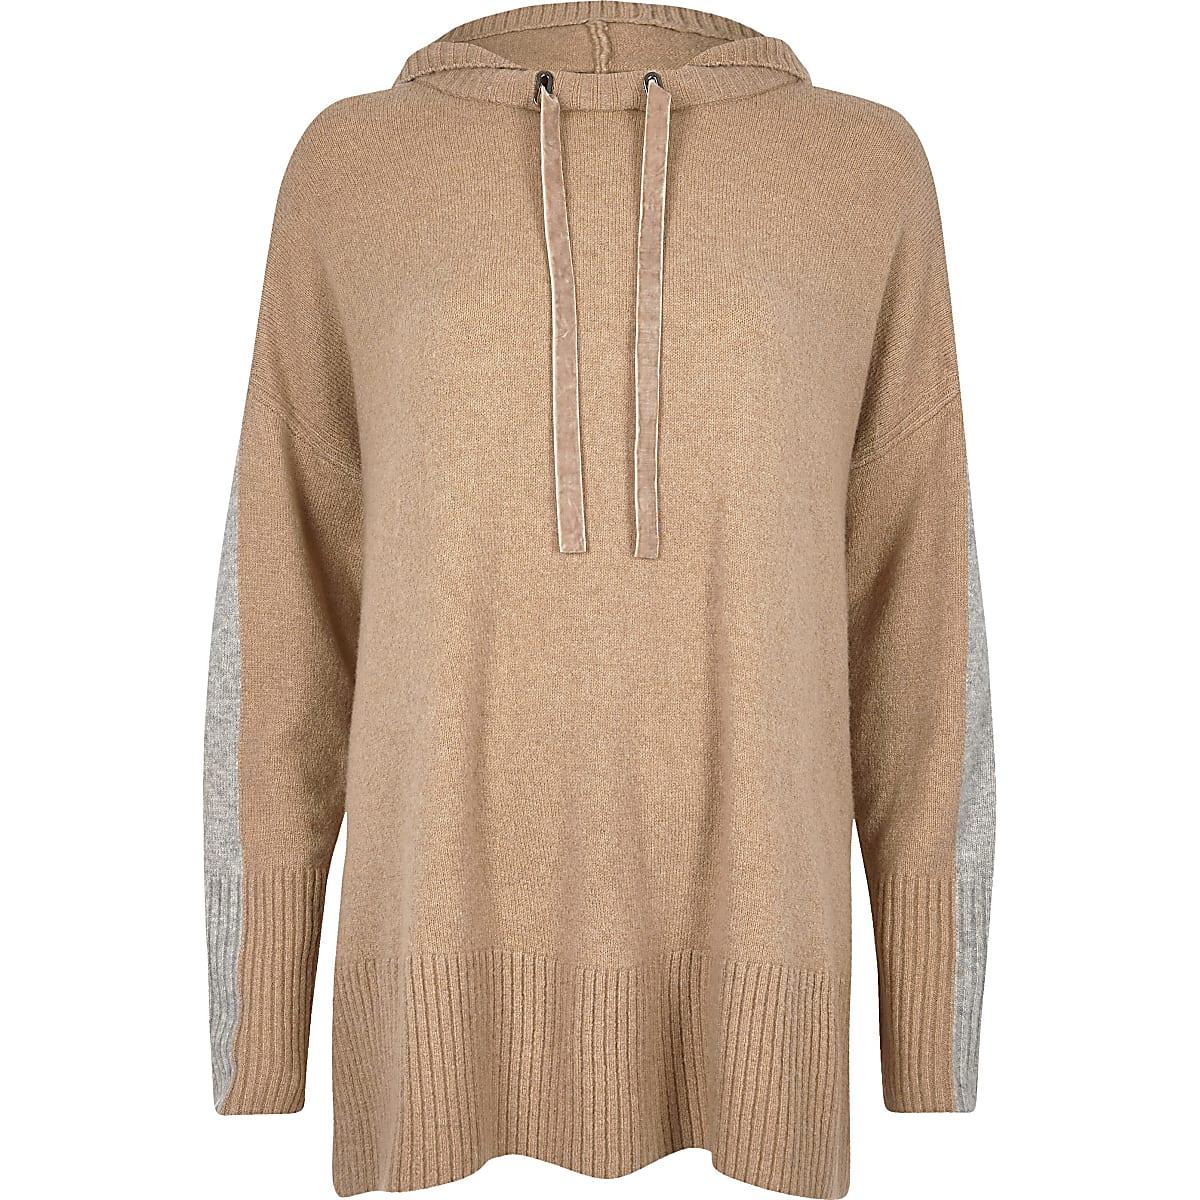 47151db5a51cbb Light brown knitted hooded jumper - Jumpers - Knitwear - women